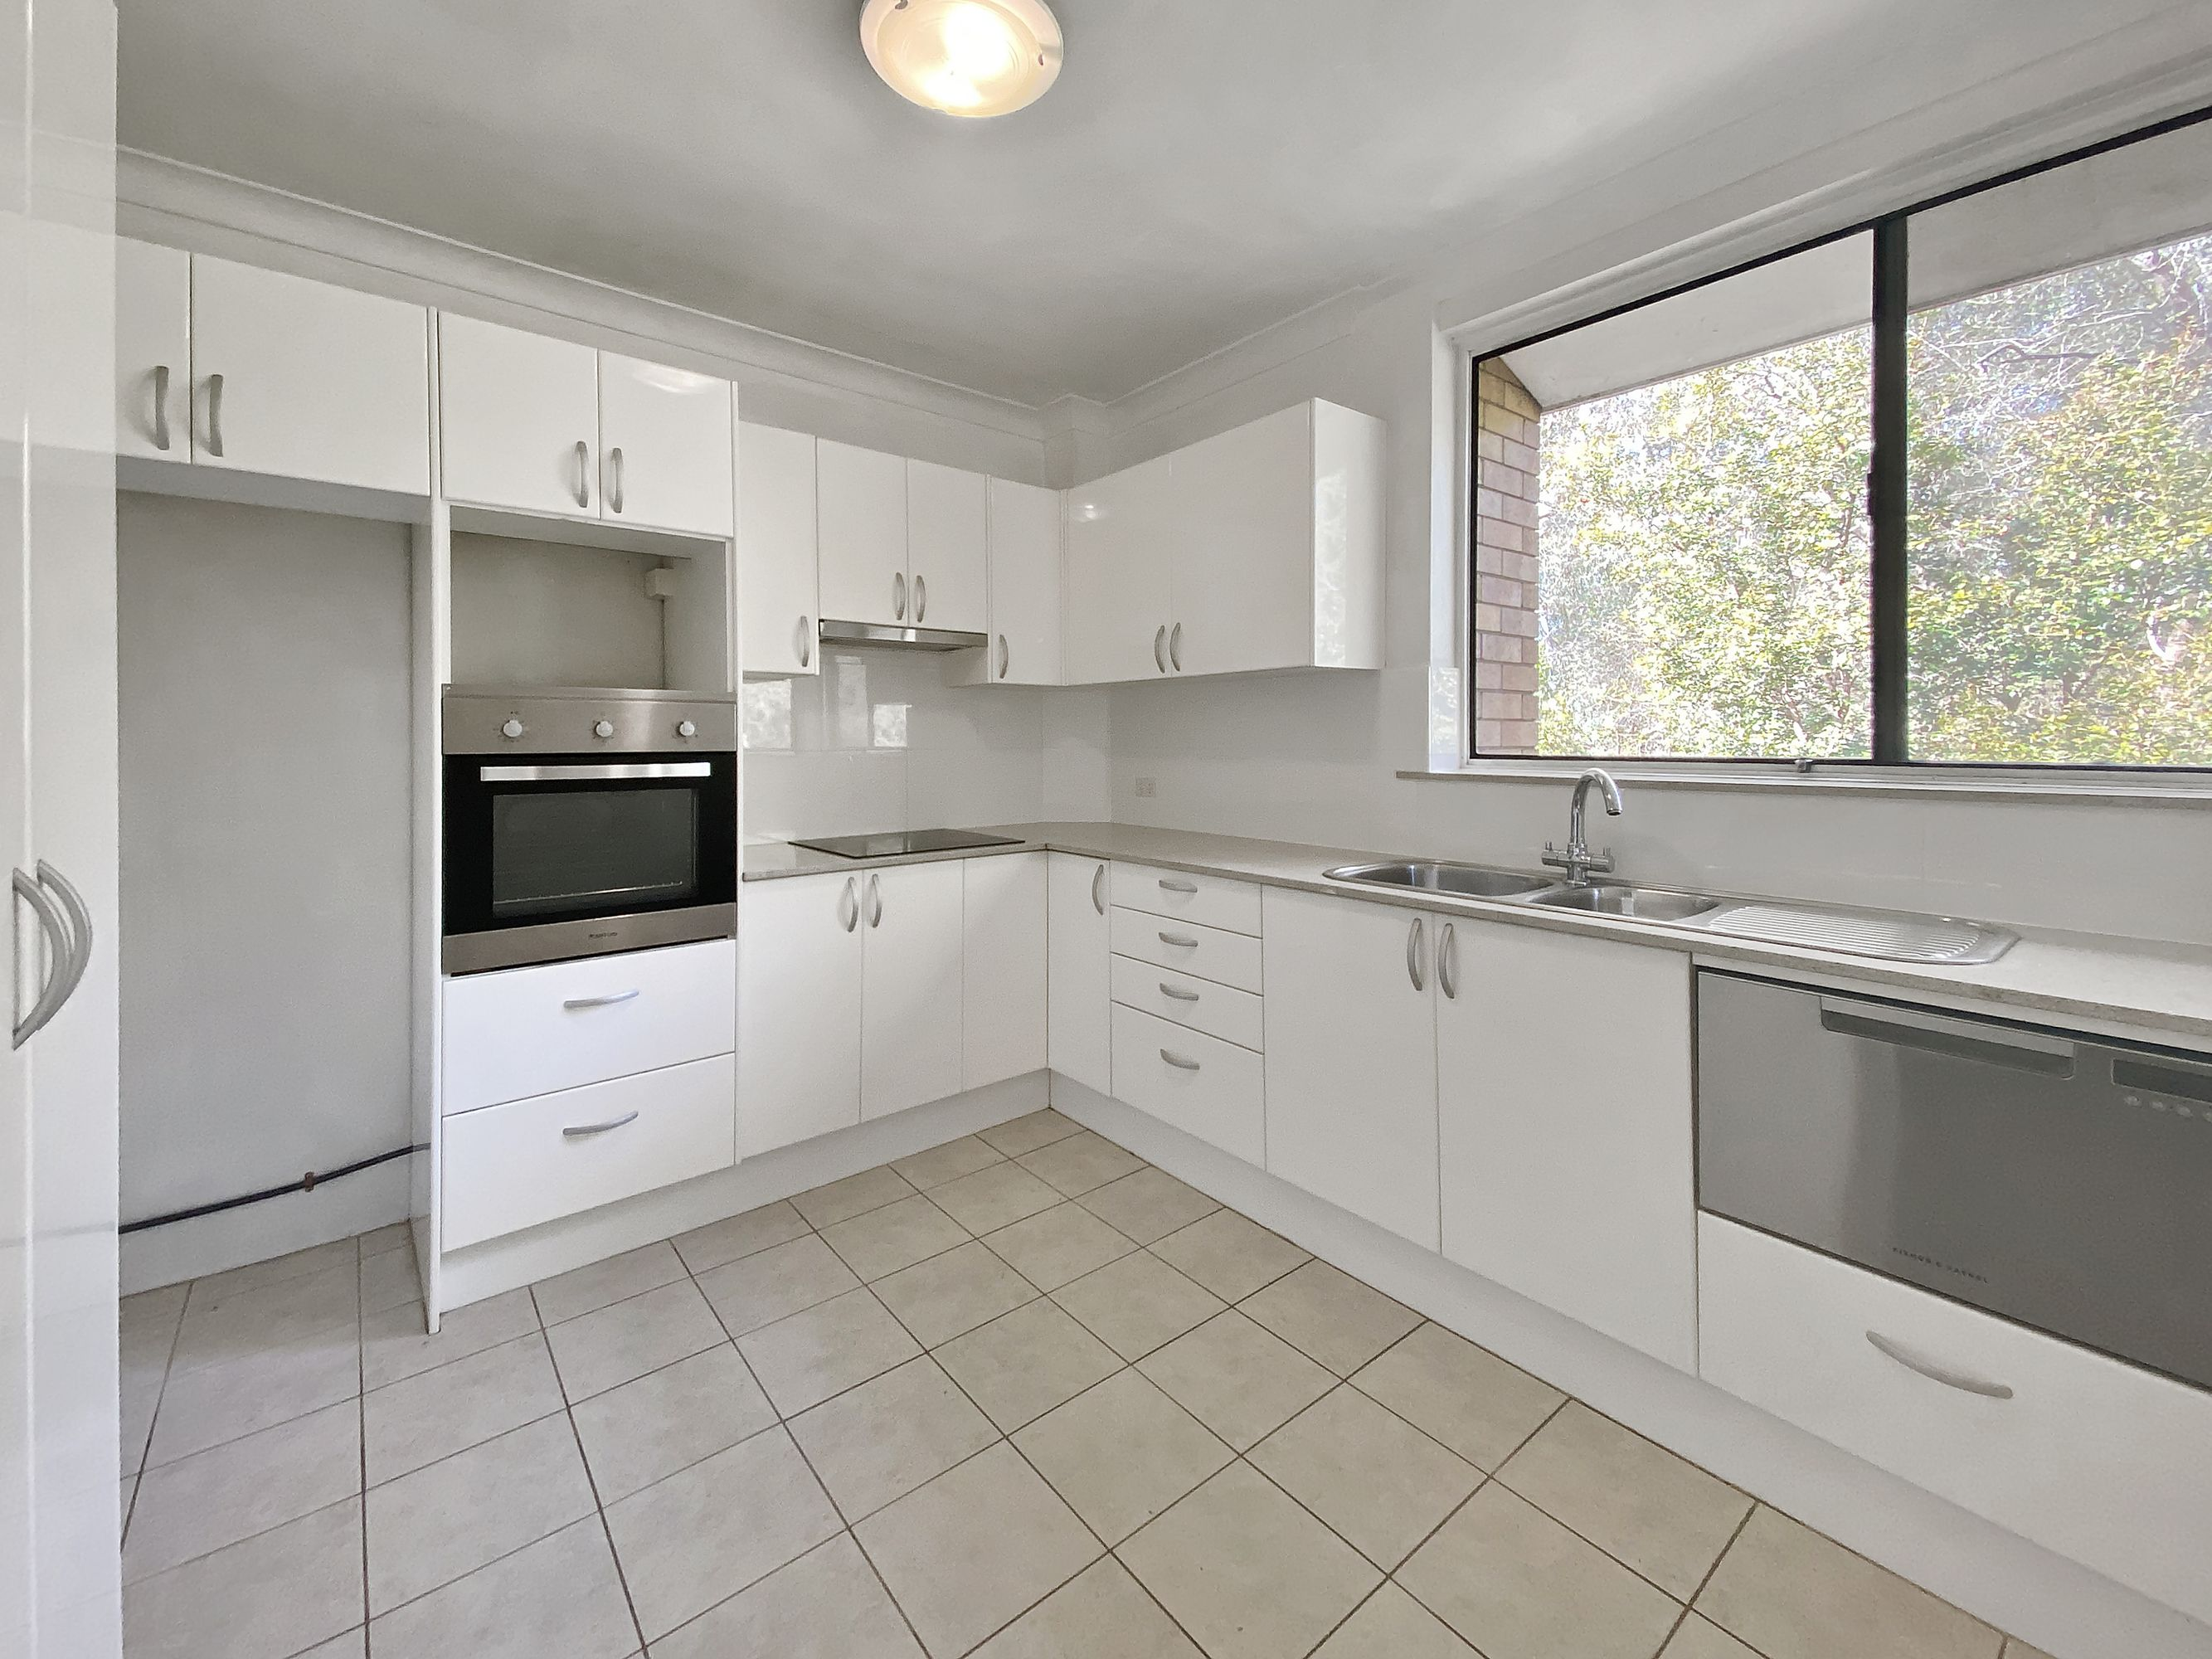 2/42 Khartoum Road, Macquarie Park, NSW 2113